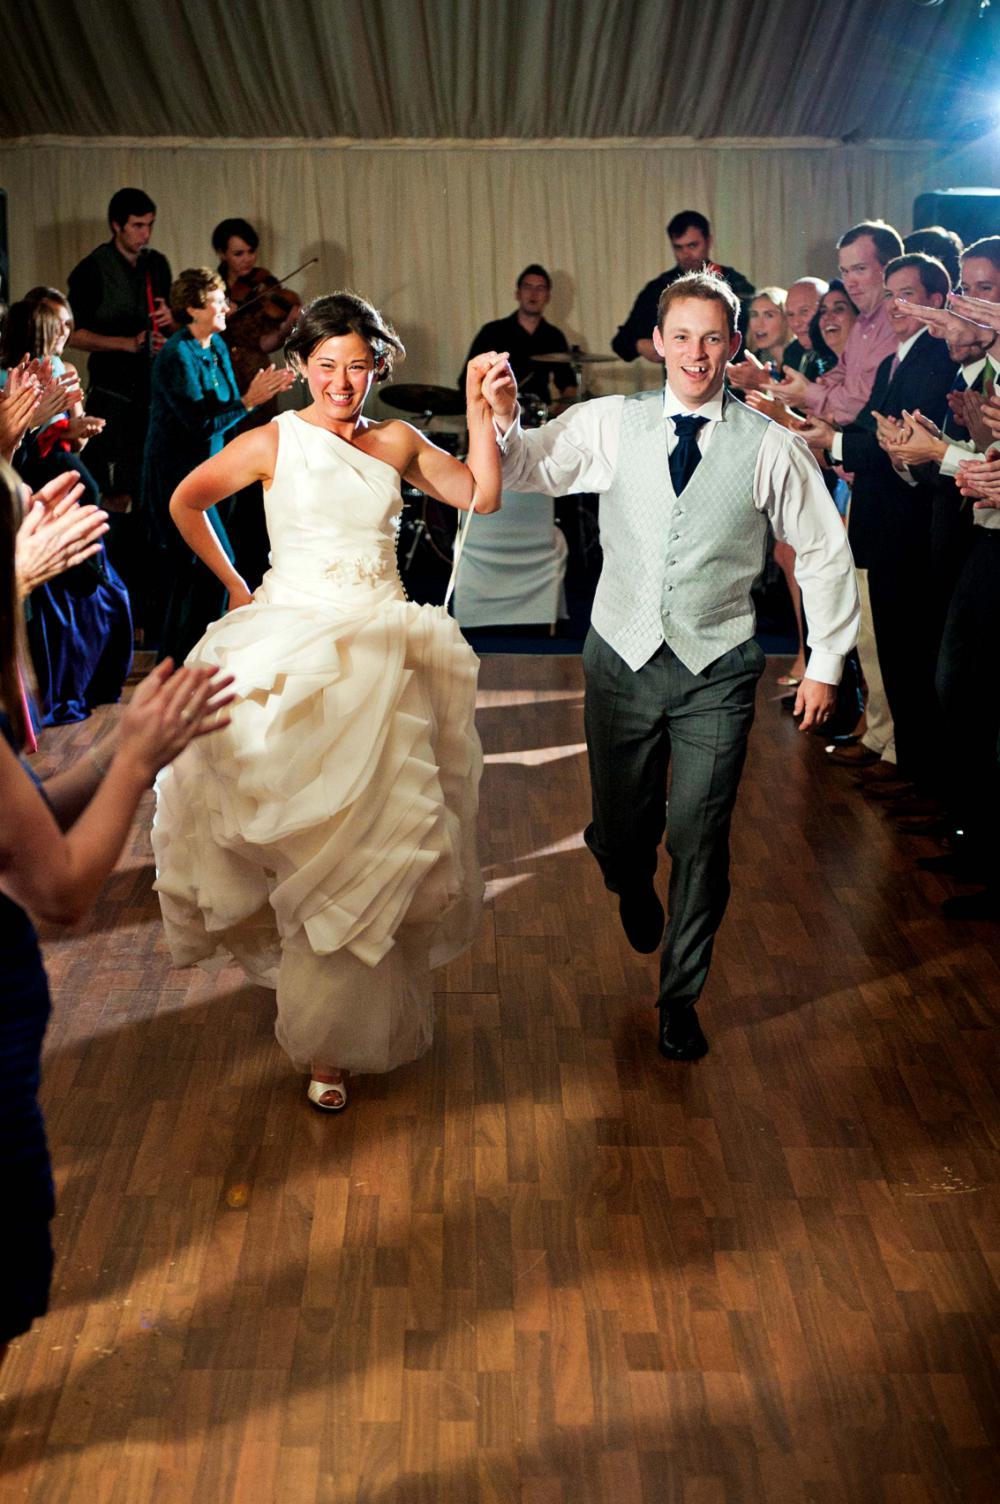 St Andrews Wedding Photographer by BKP